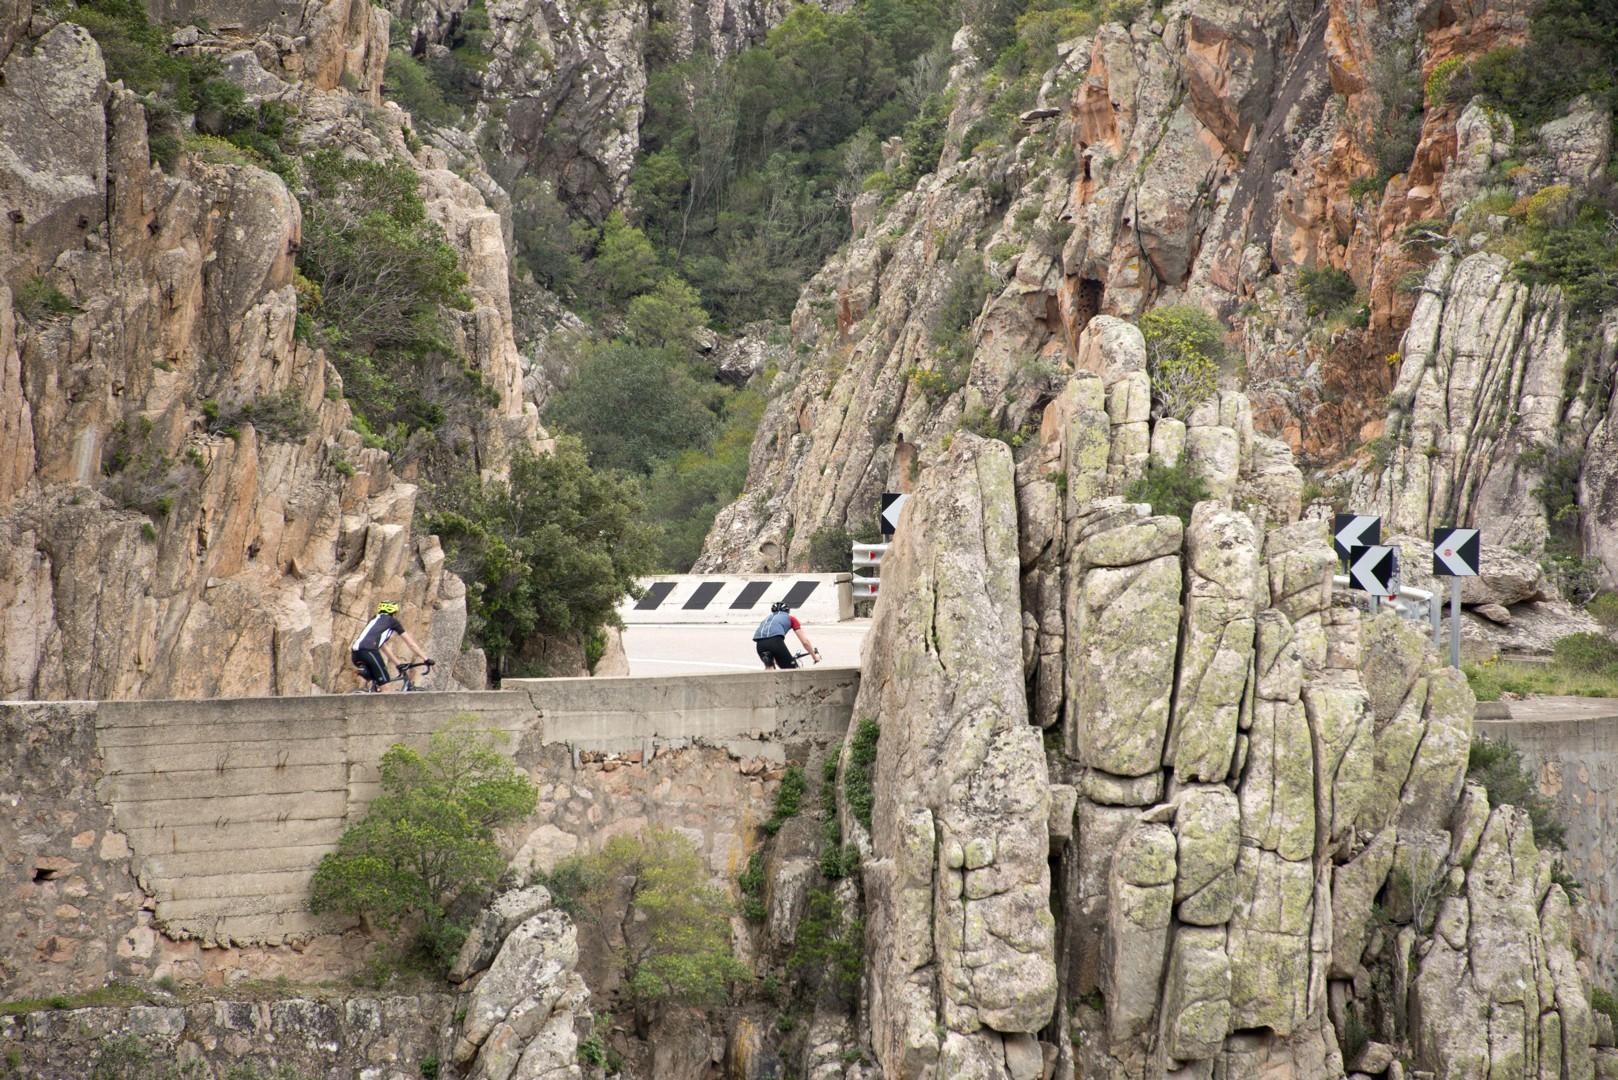 FCD5955.jpg - Italy - Sardinia - Mountain Explorer - Guided Road Cycling Holiday - Italia Road Cycling